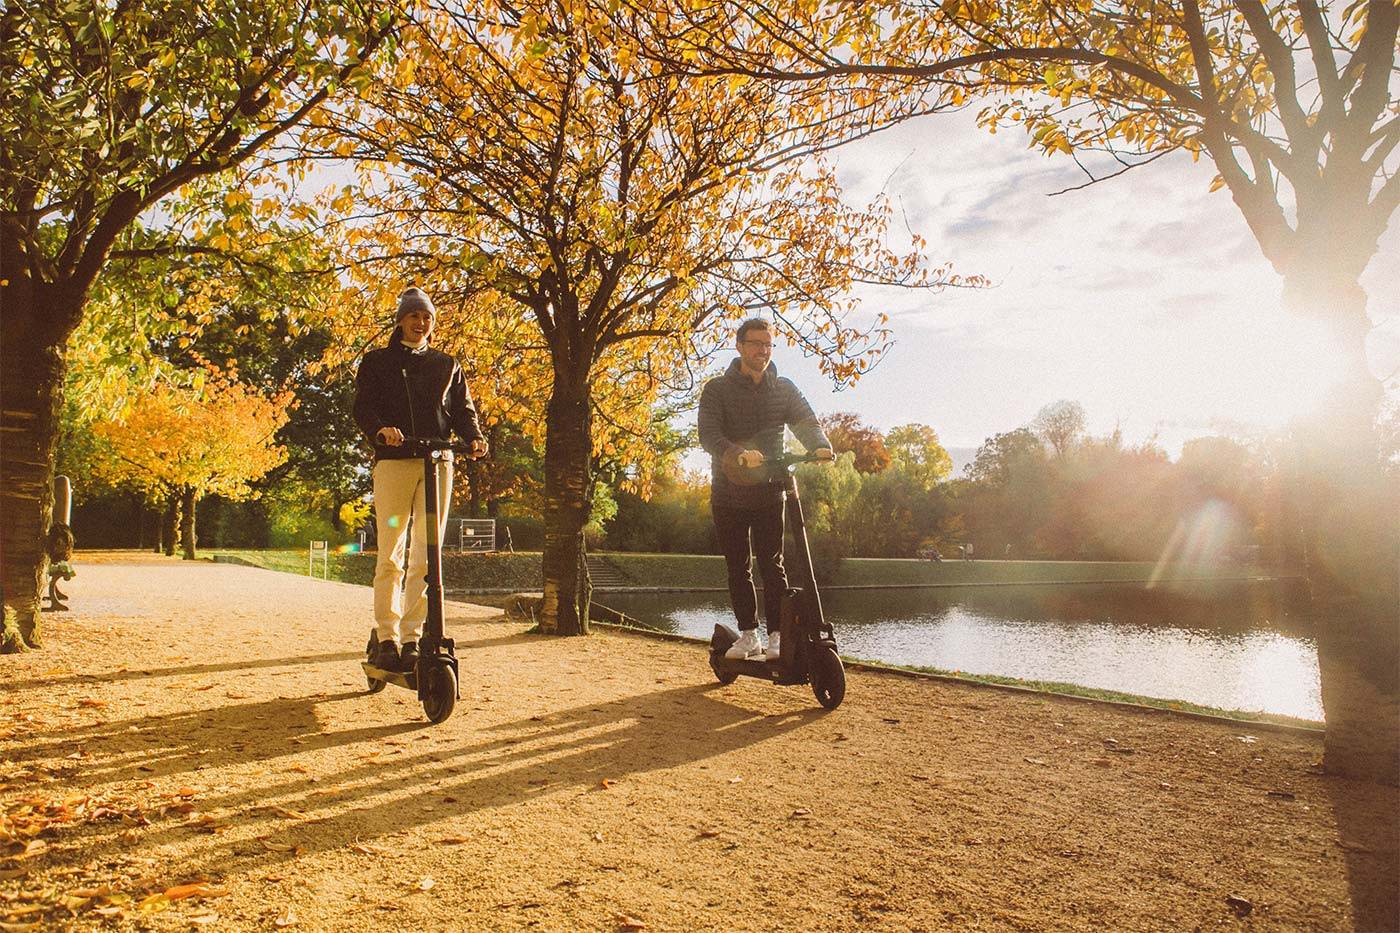 okai-es200-escooter-couple-riding-scooters-autumn-path